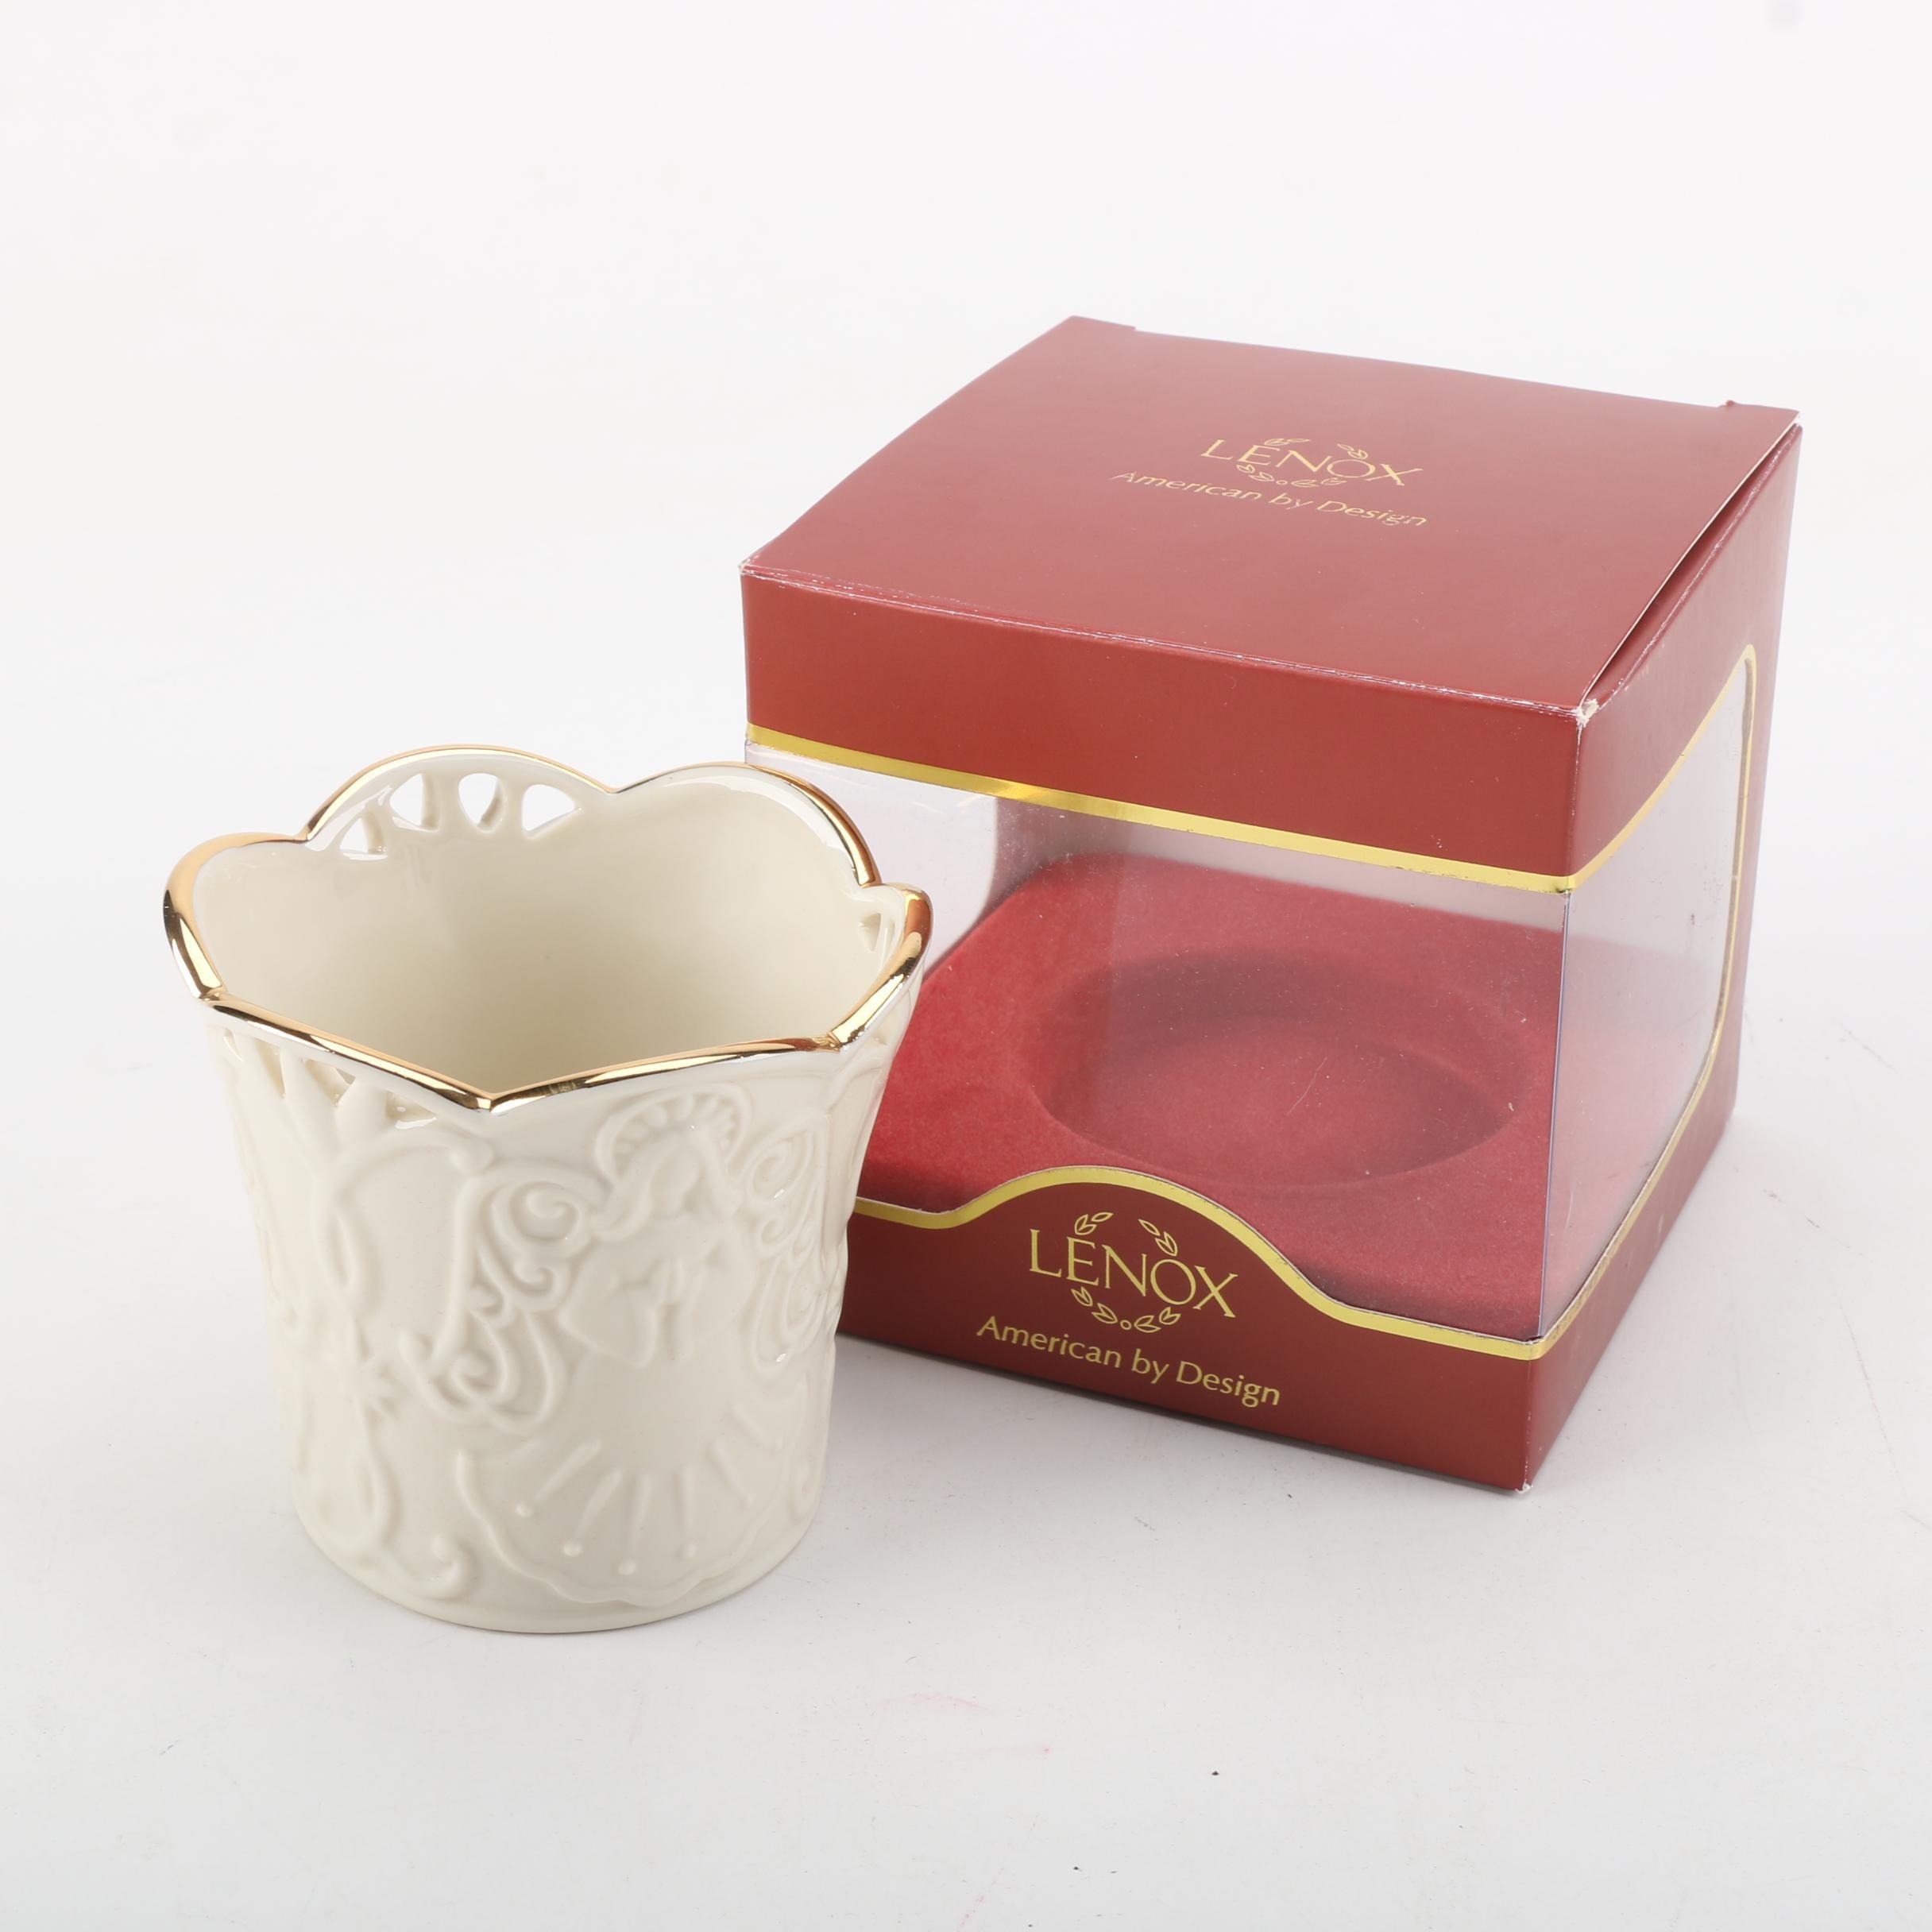 Lenox Angel Candle Holder